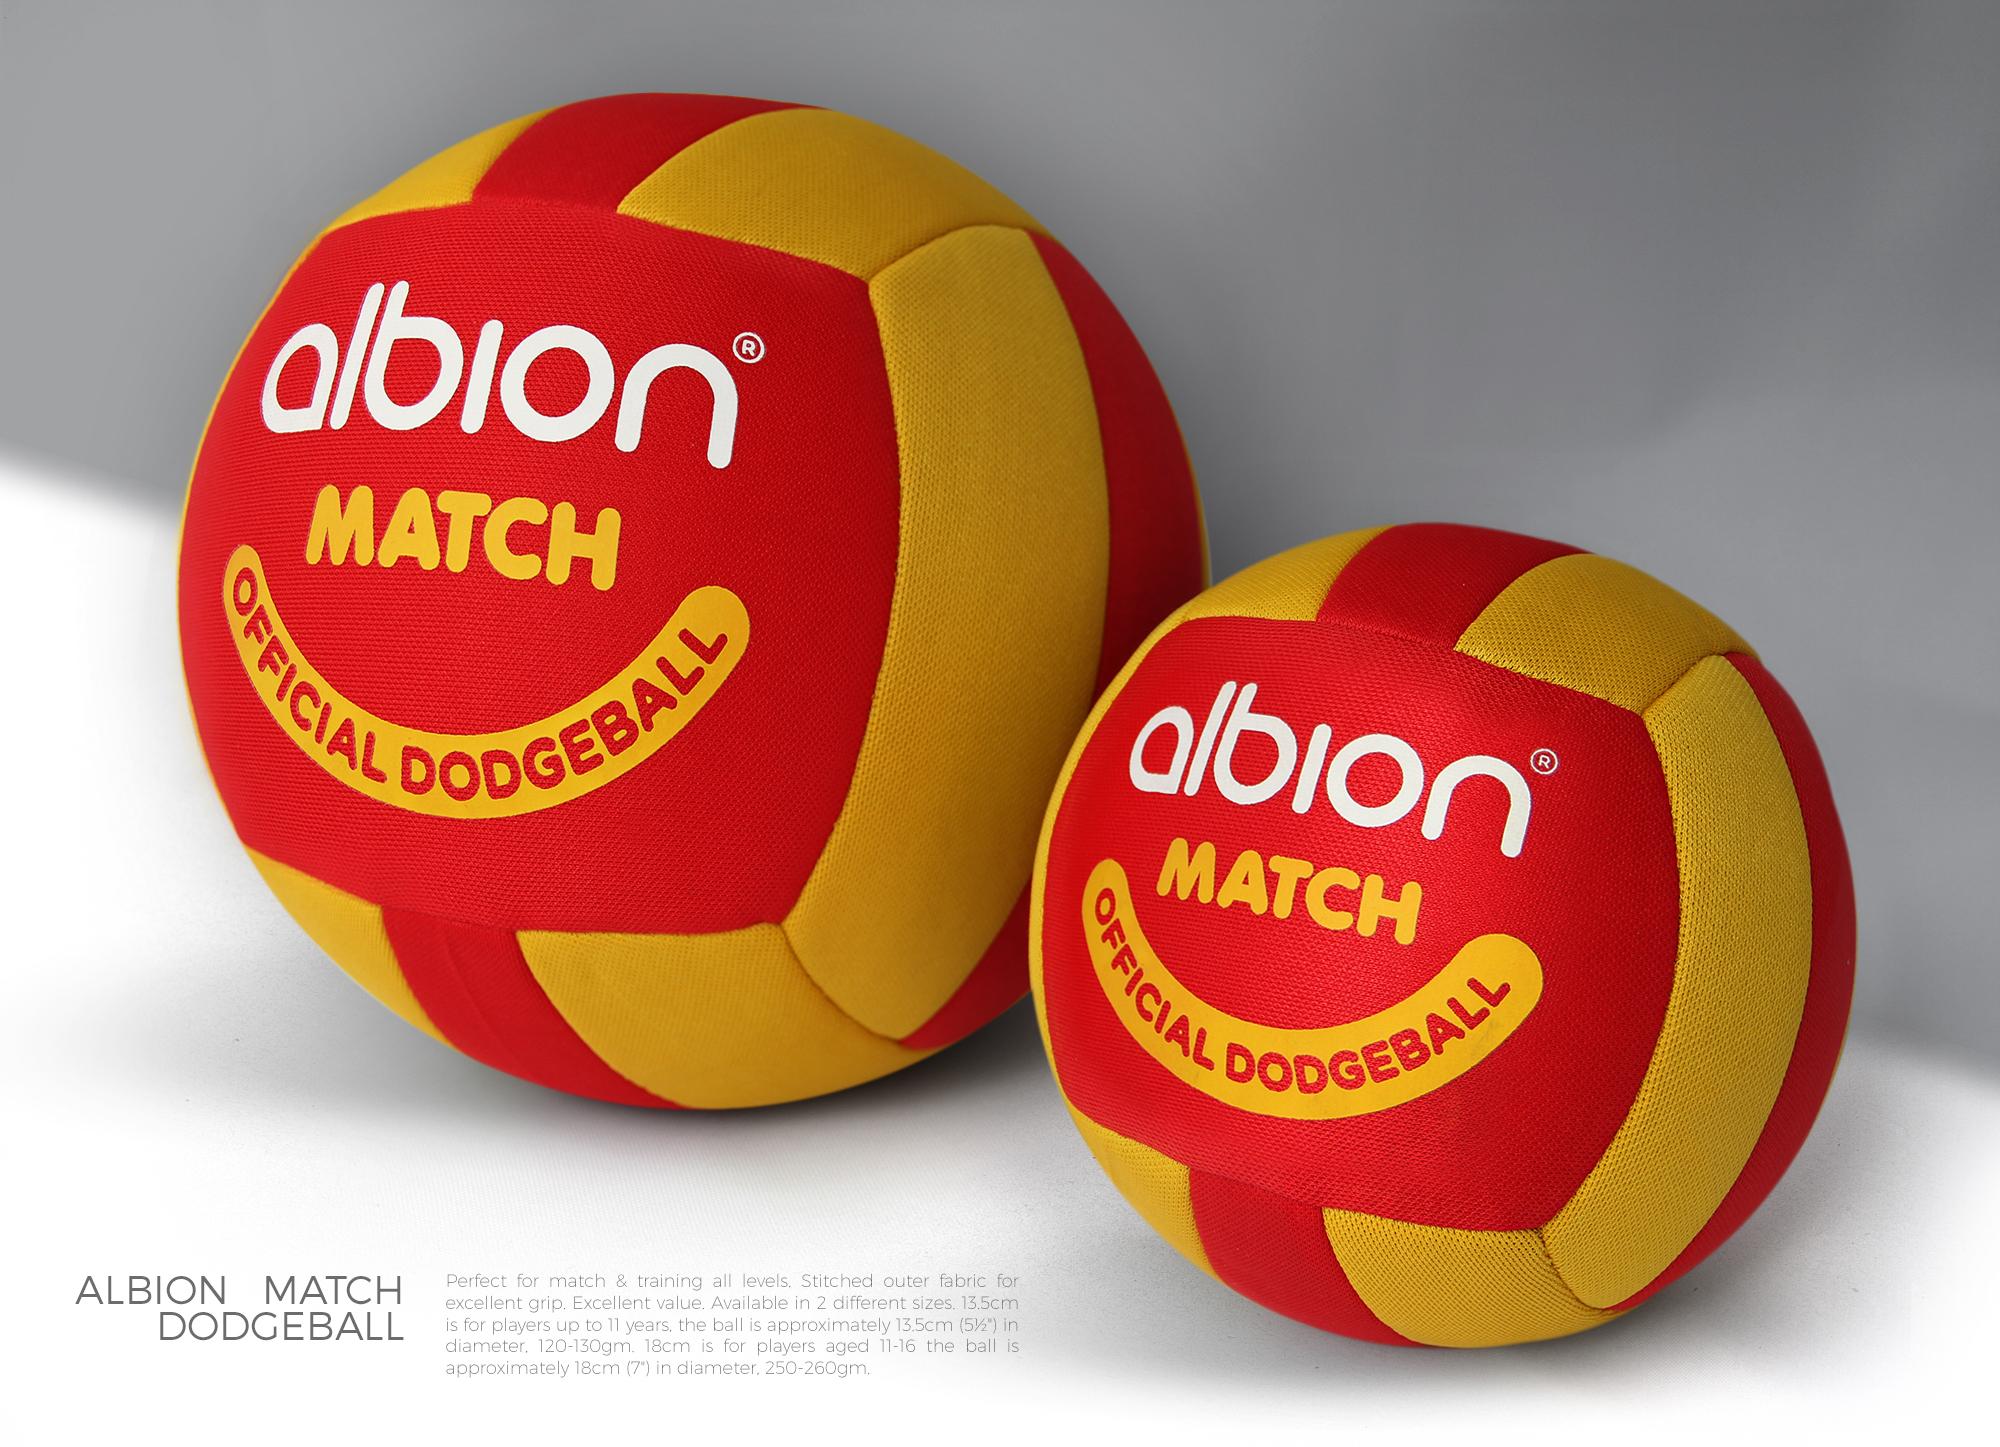 Albion Match Dodgeball / Rebranding / Logobou 2